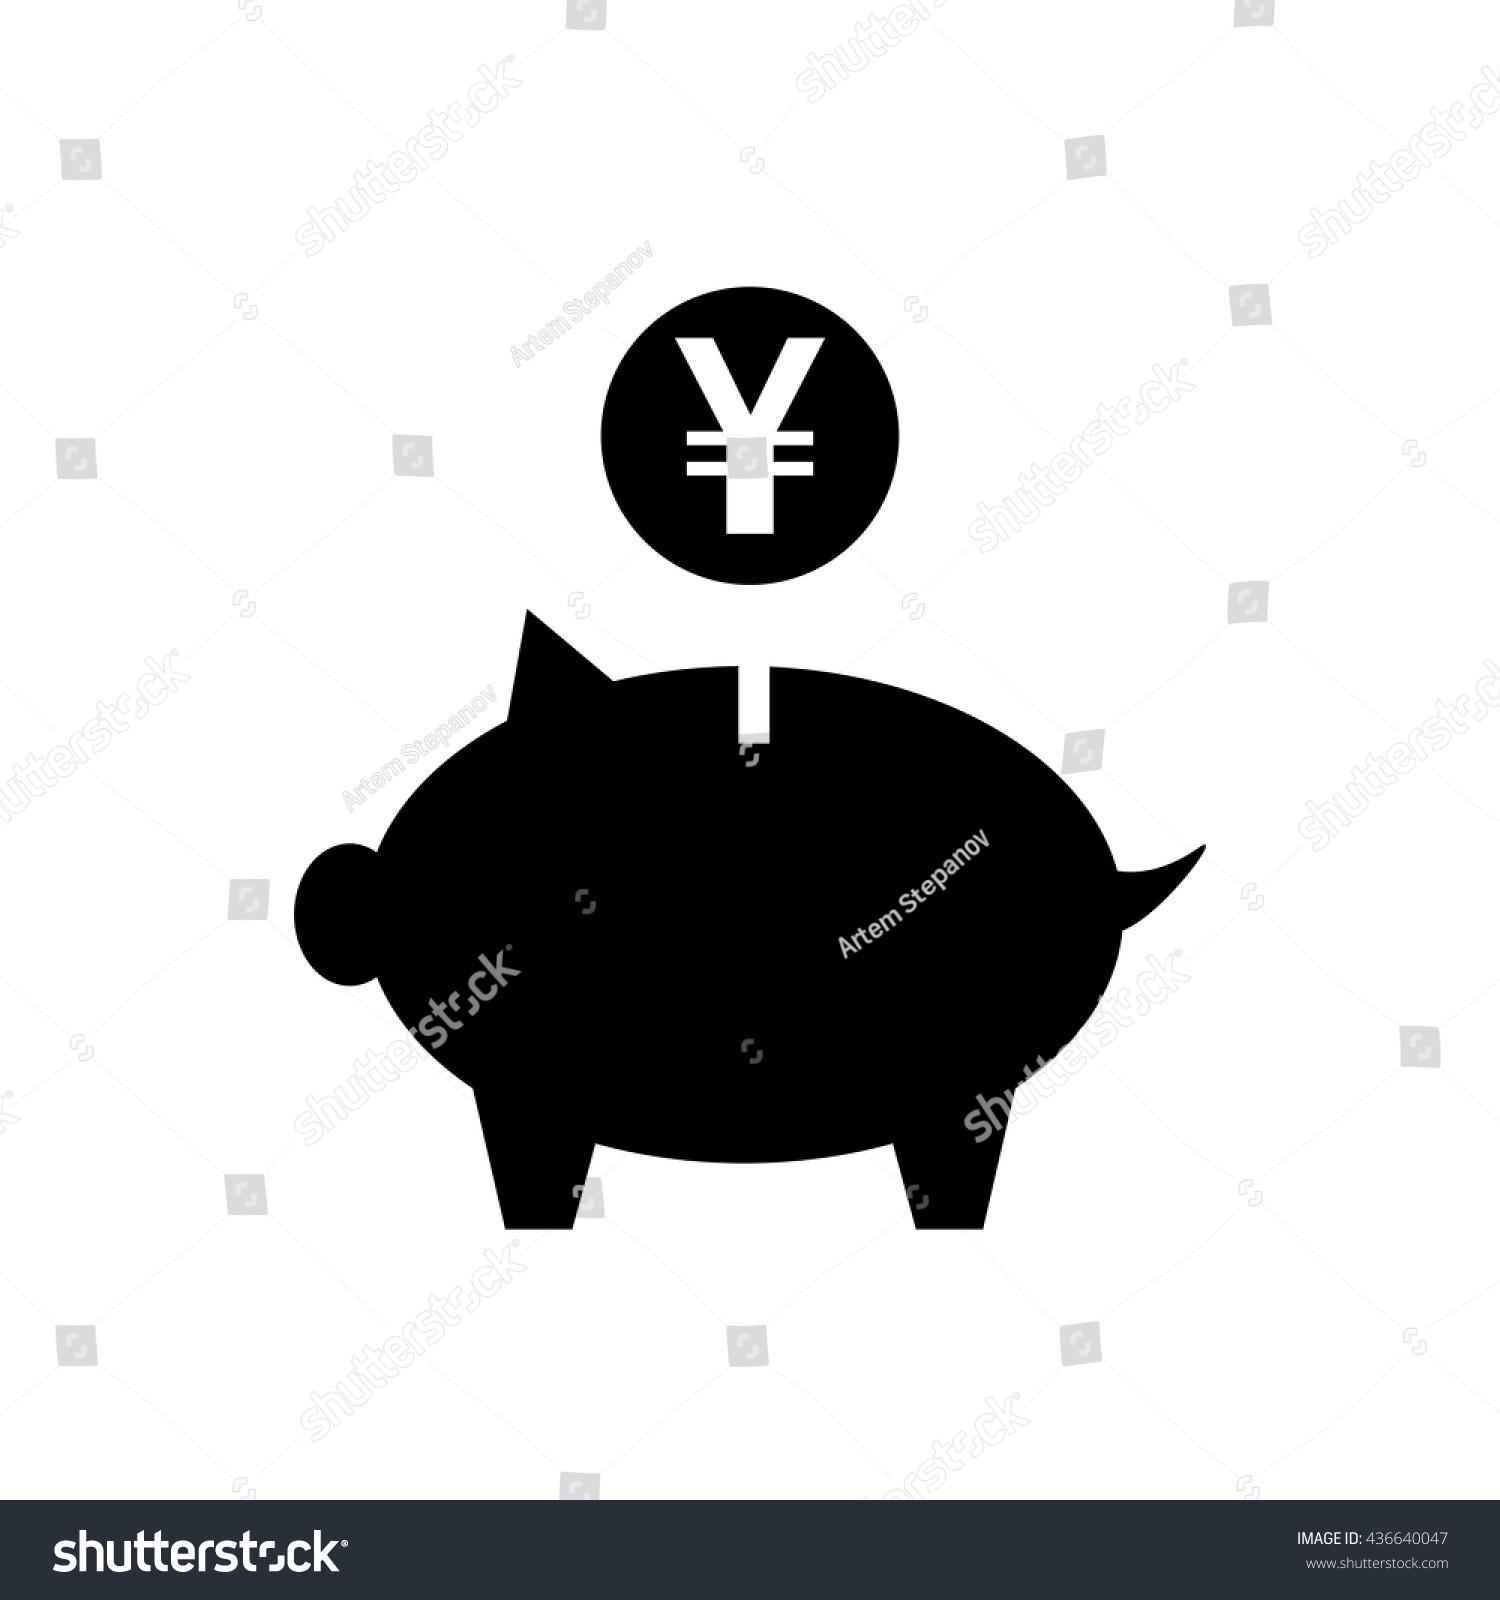 Chinese yen currency symbol view symbol biocorpaavc